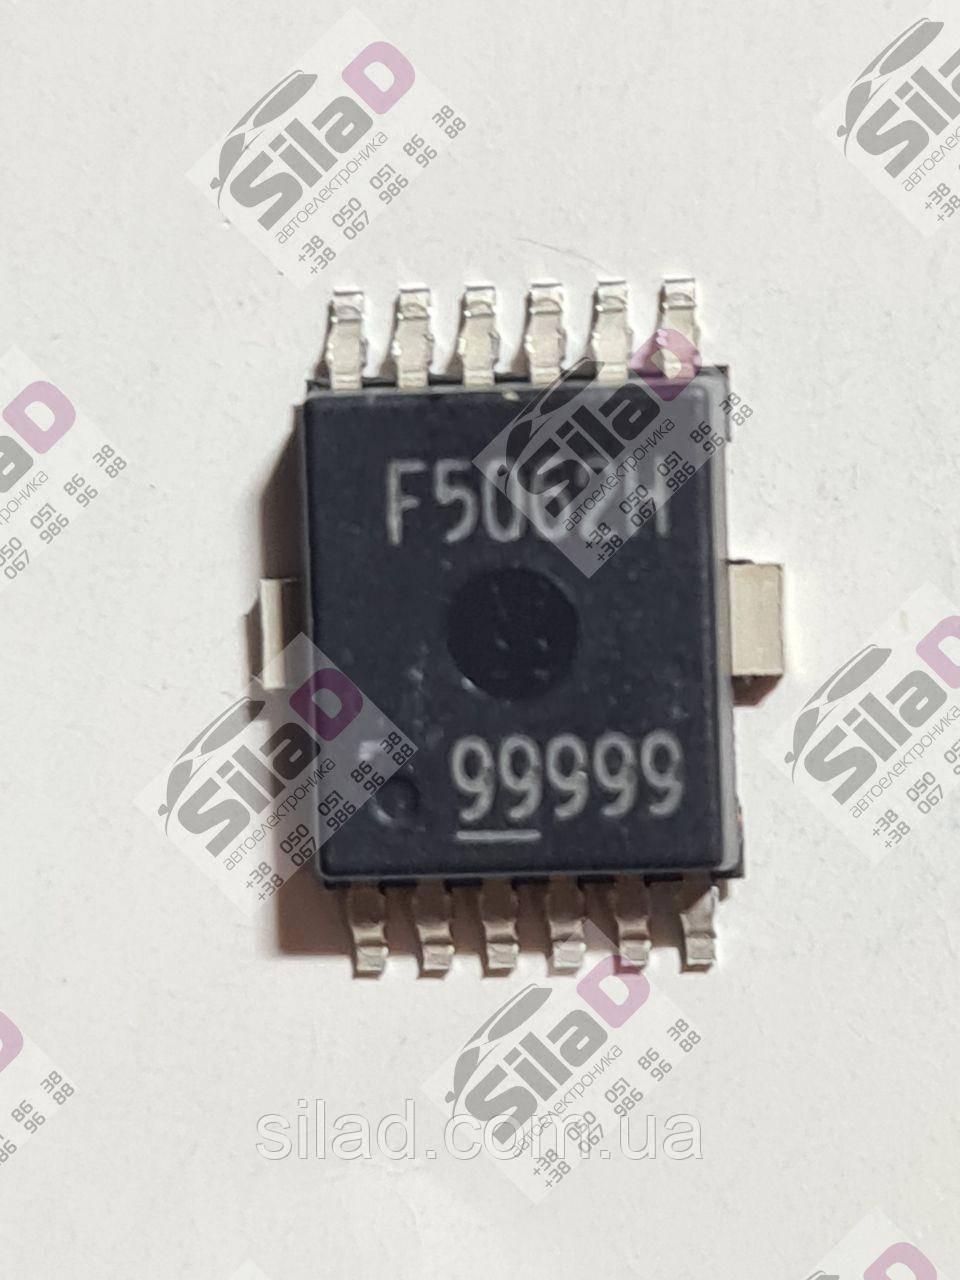 Микросхема F5062H Fuji Electric корпус  PSOP-12